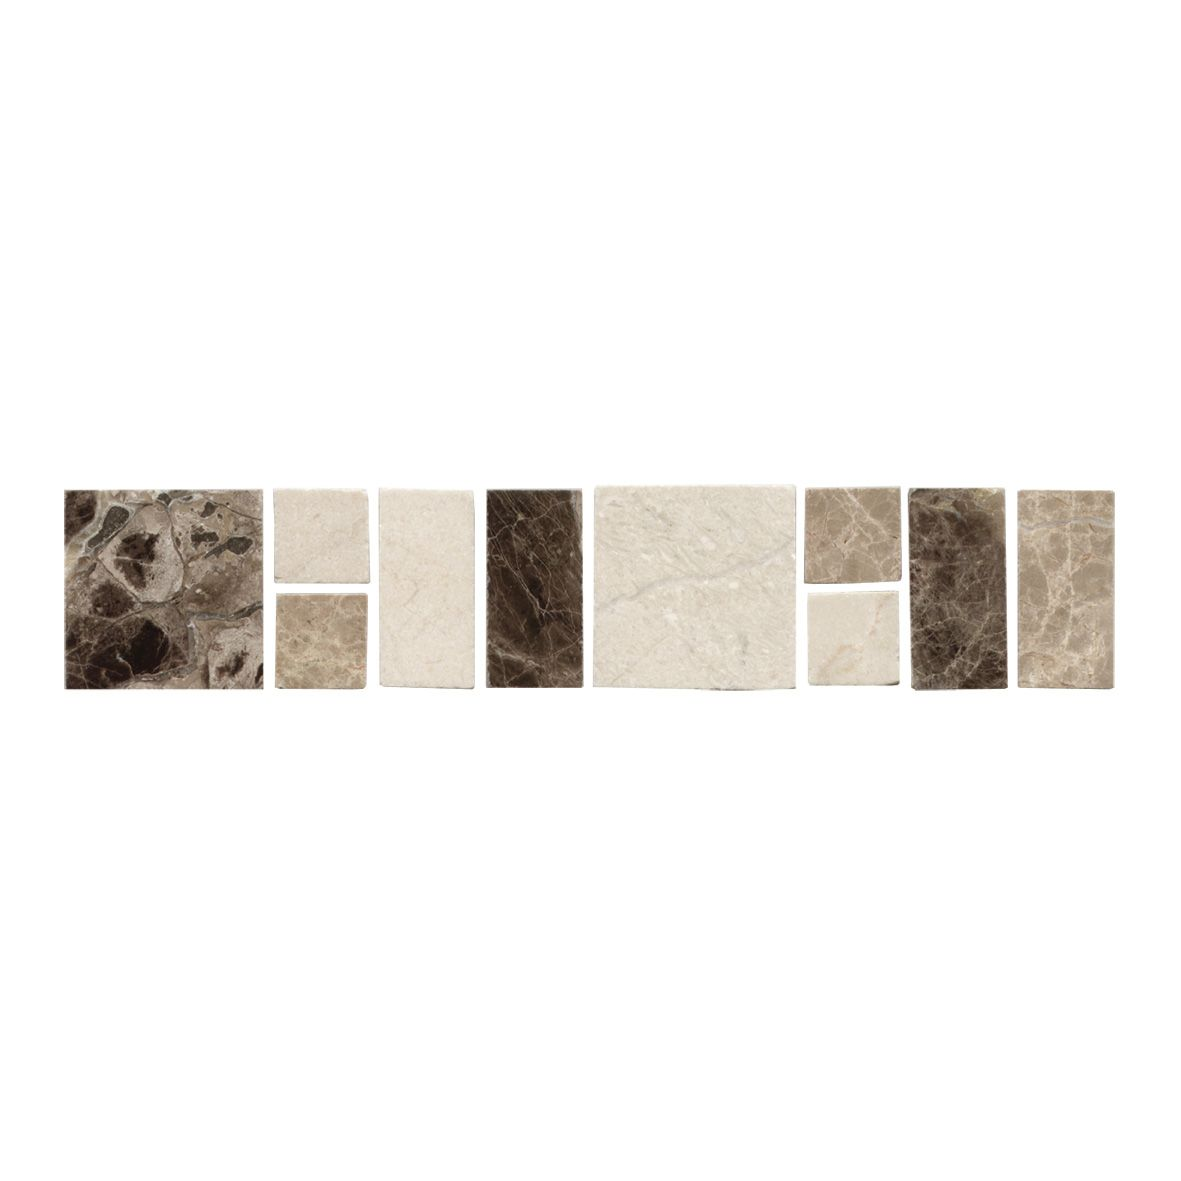 Gemini Natural Border Tile AP136 | Kitchen and Bathroom Décor Tiles ...